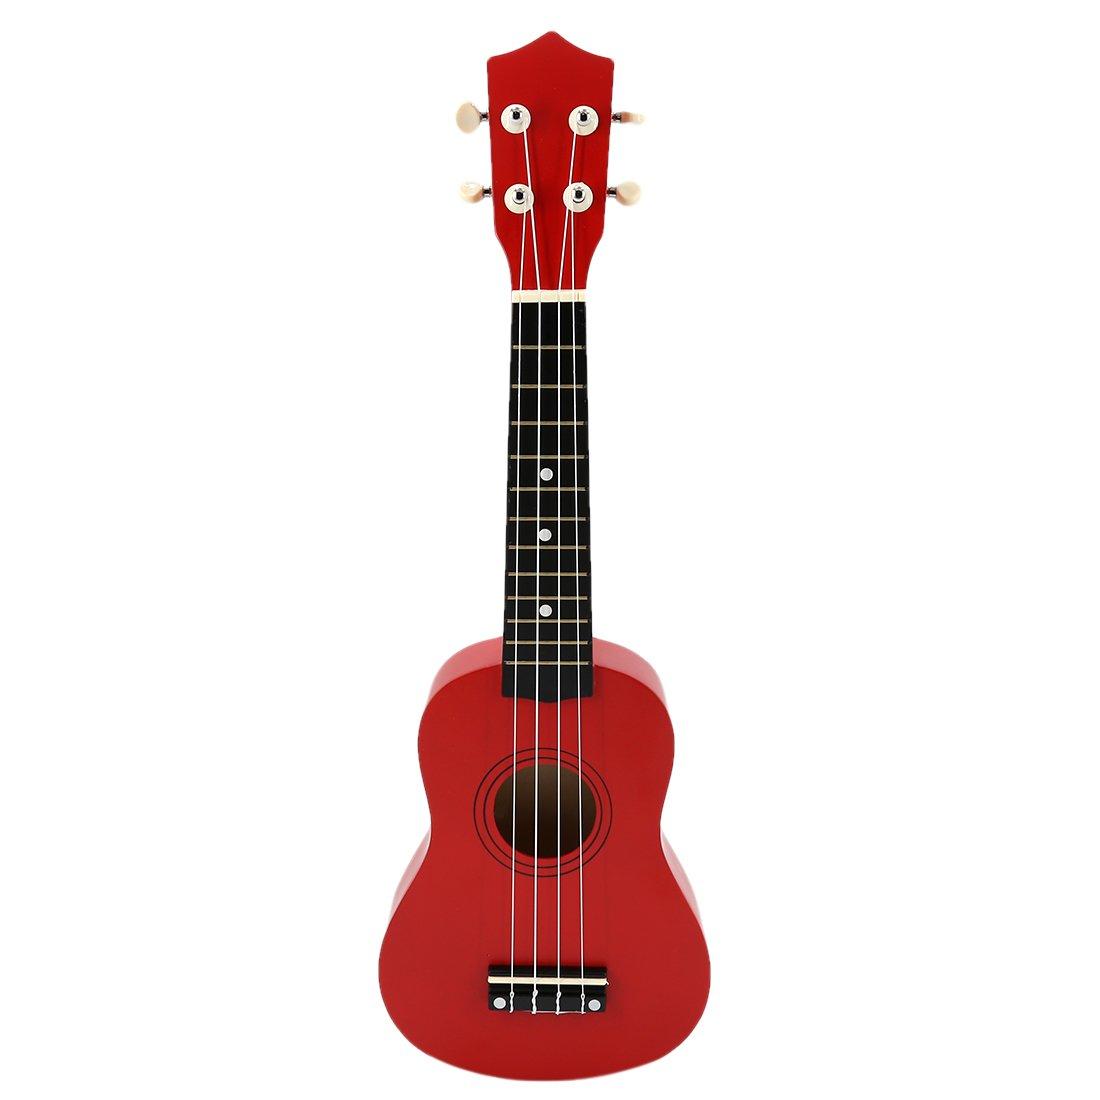 Ukulele, WOLFBUSH 21 Inches Environmental Children Guitar Wooden Ukulele For Adults Kids - Red by WOLFBUSH